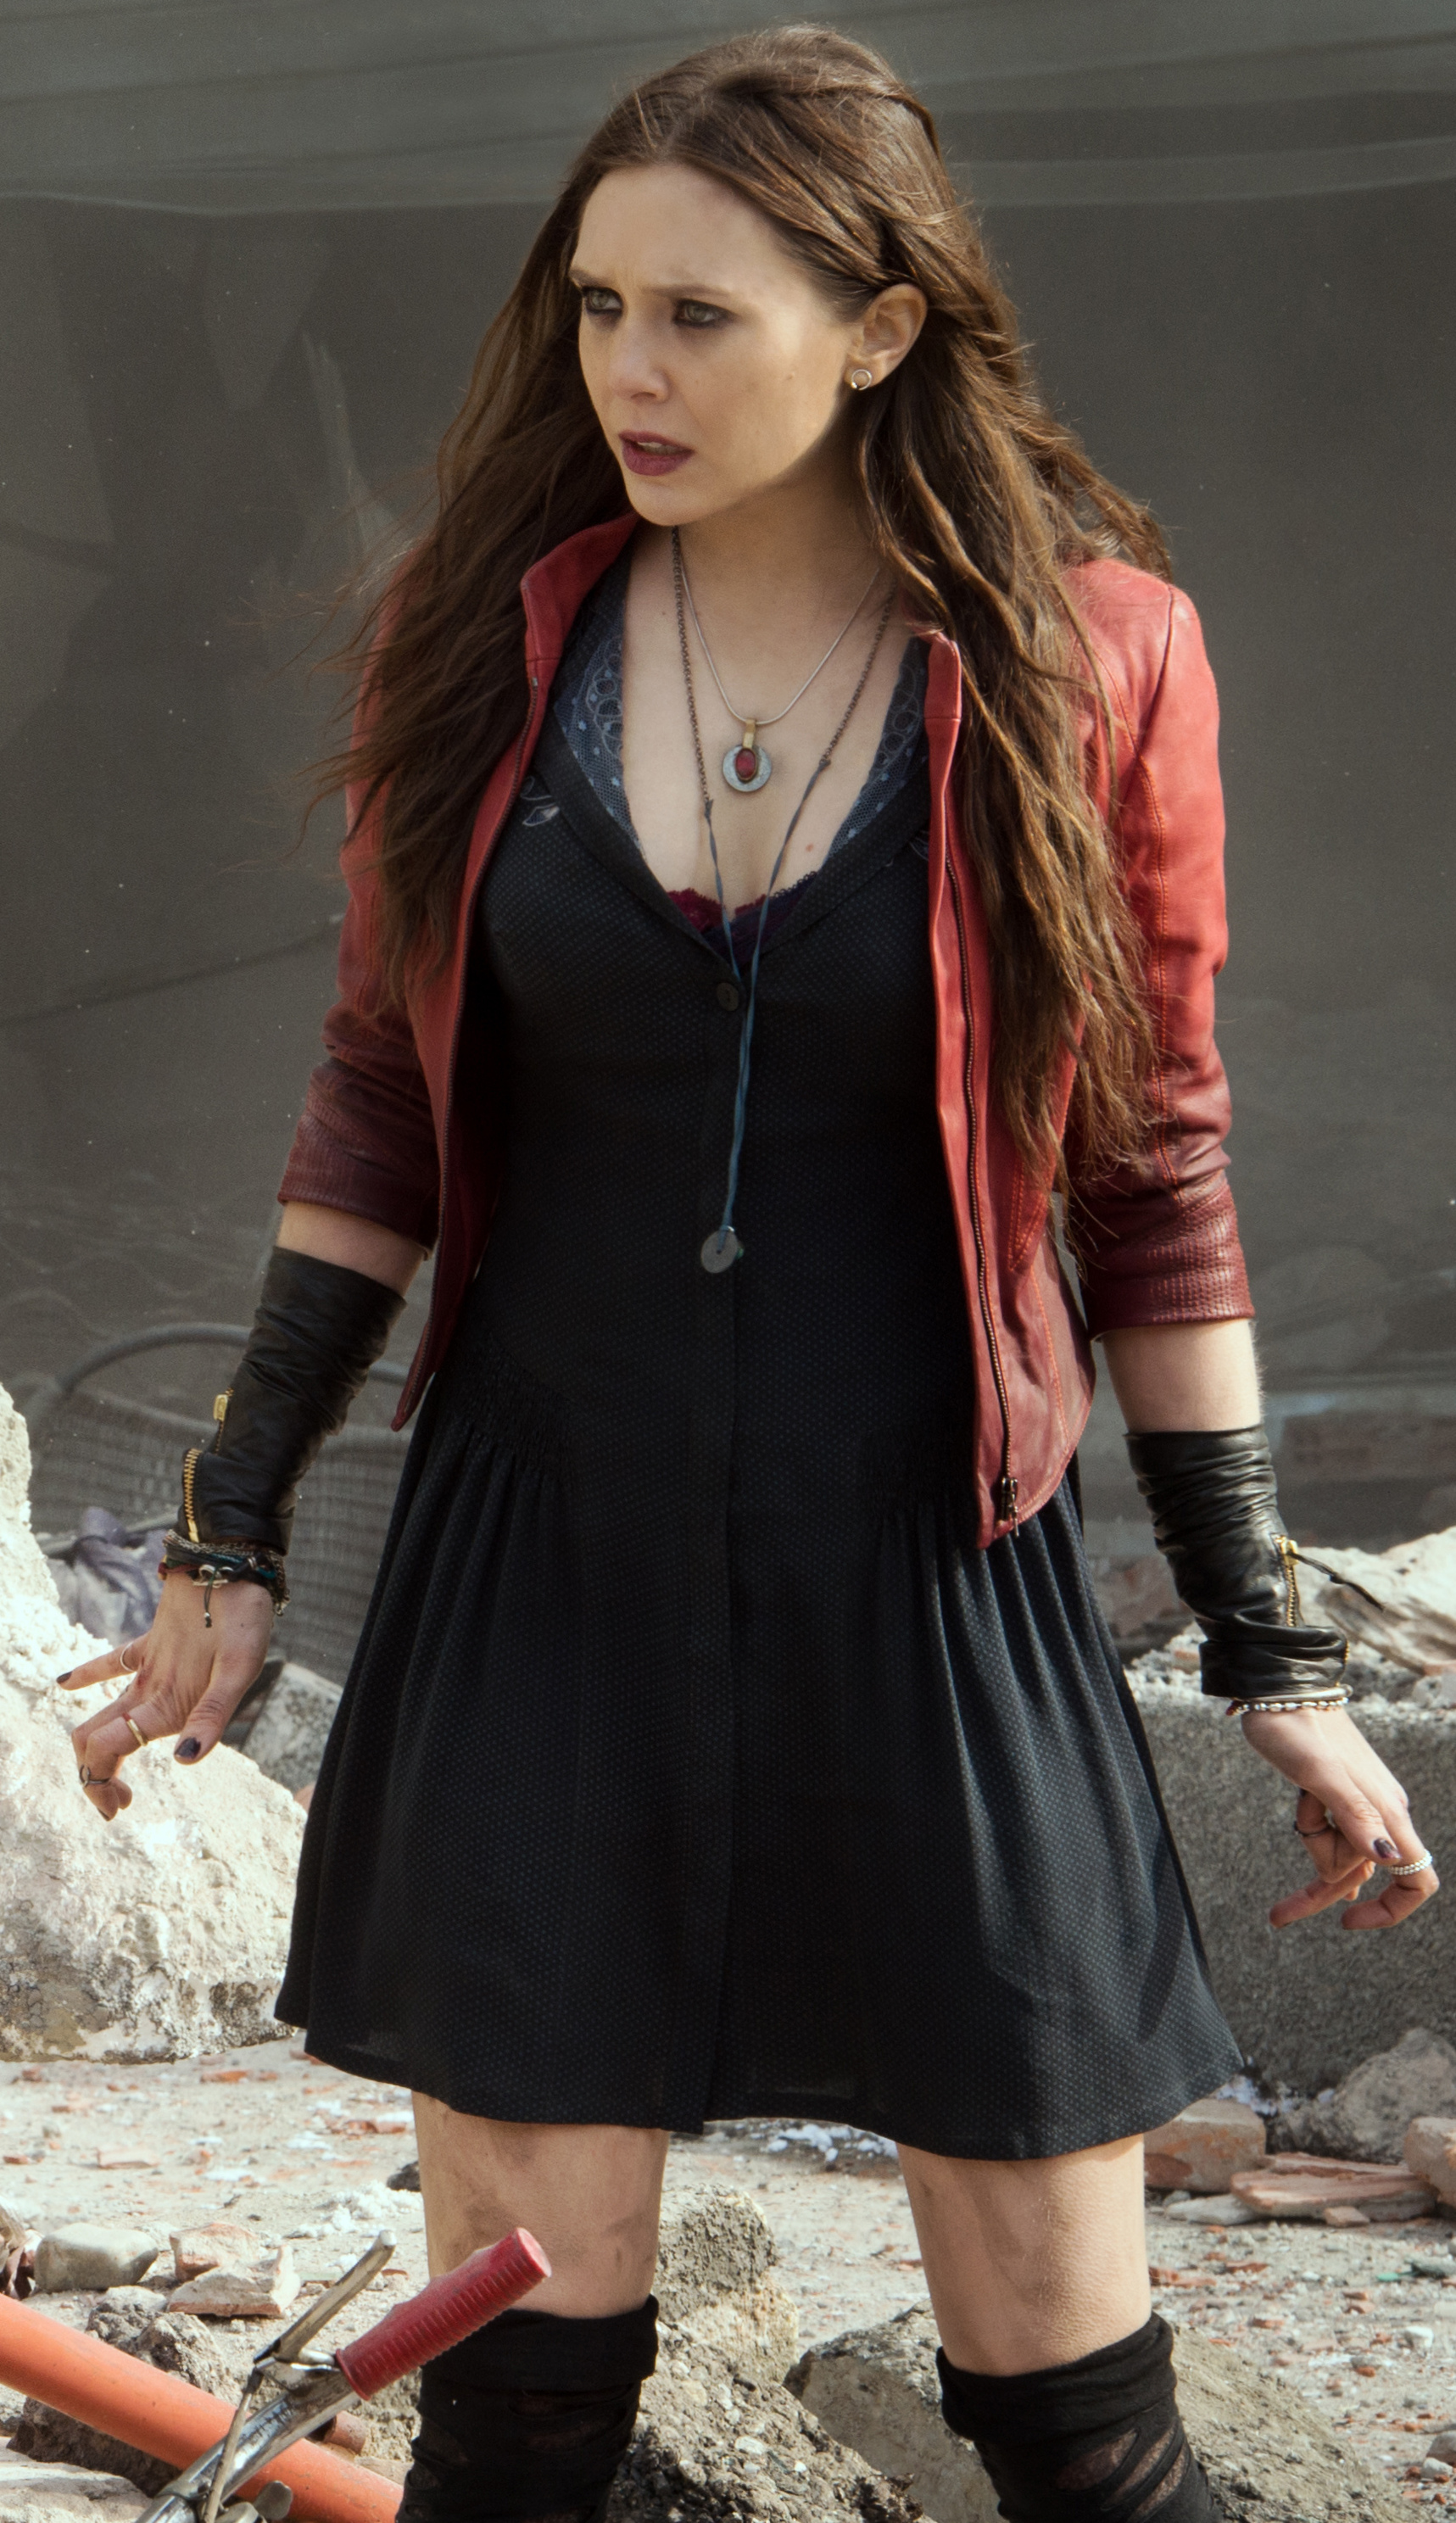 scarlet witch - photo #26